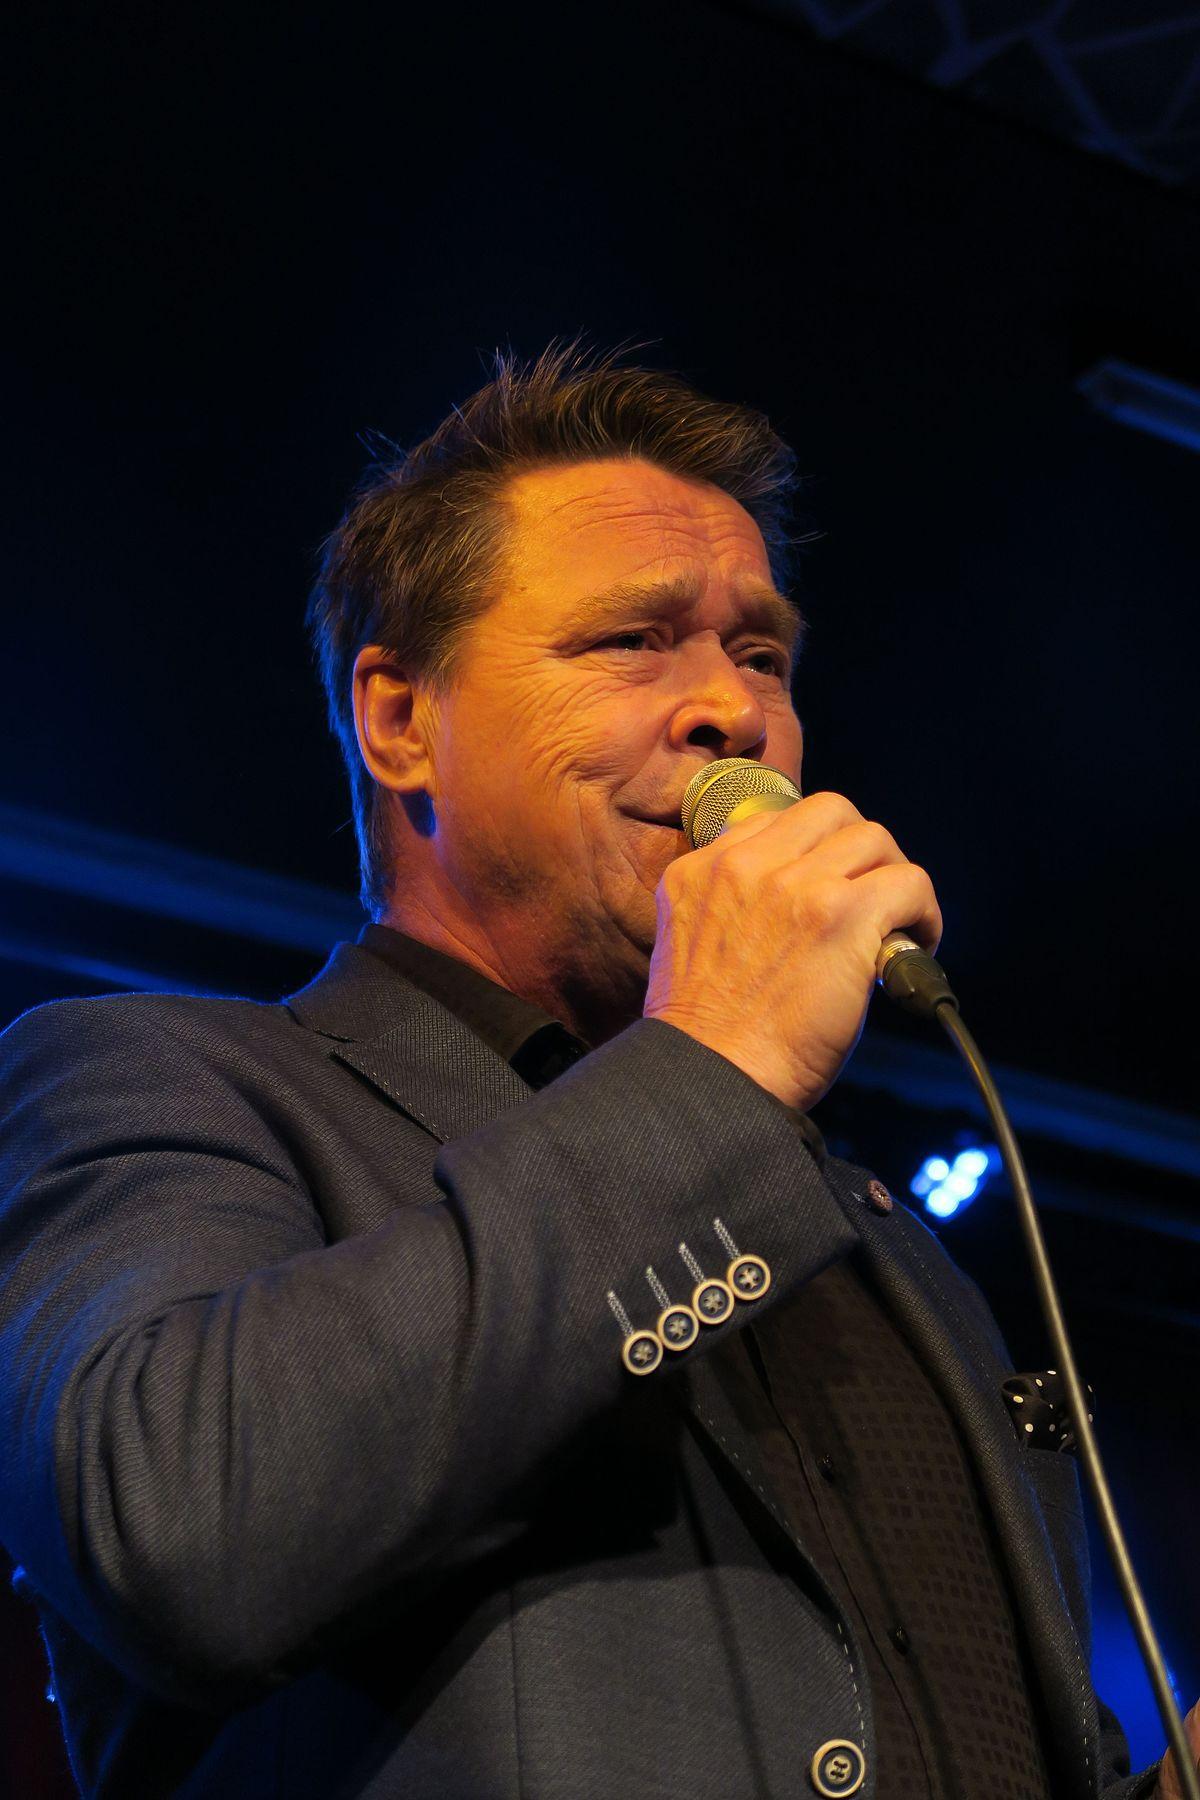 Markku Aro